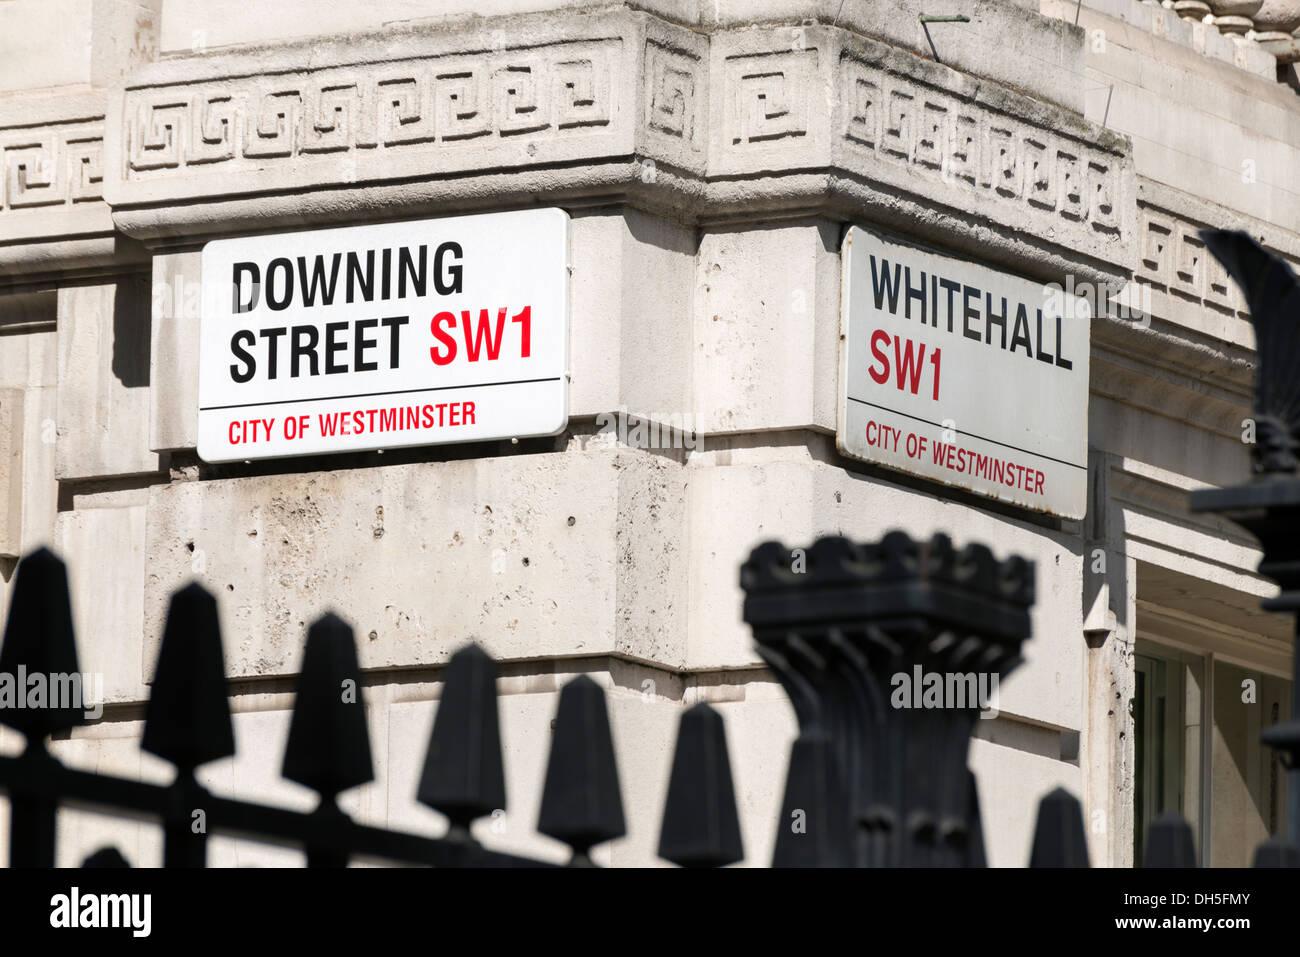 Corner of Downing Street and Whitehall, London, England, UK - Stock Image